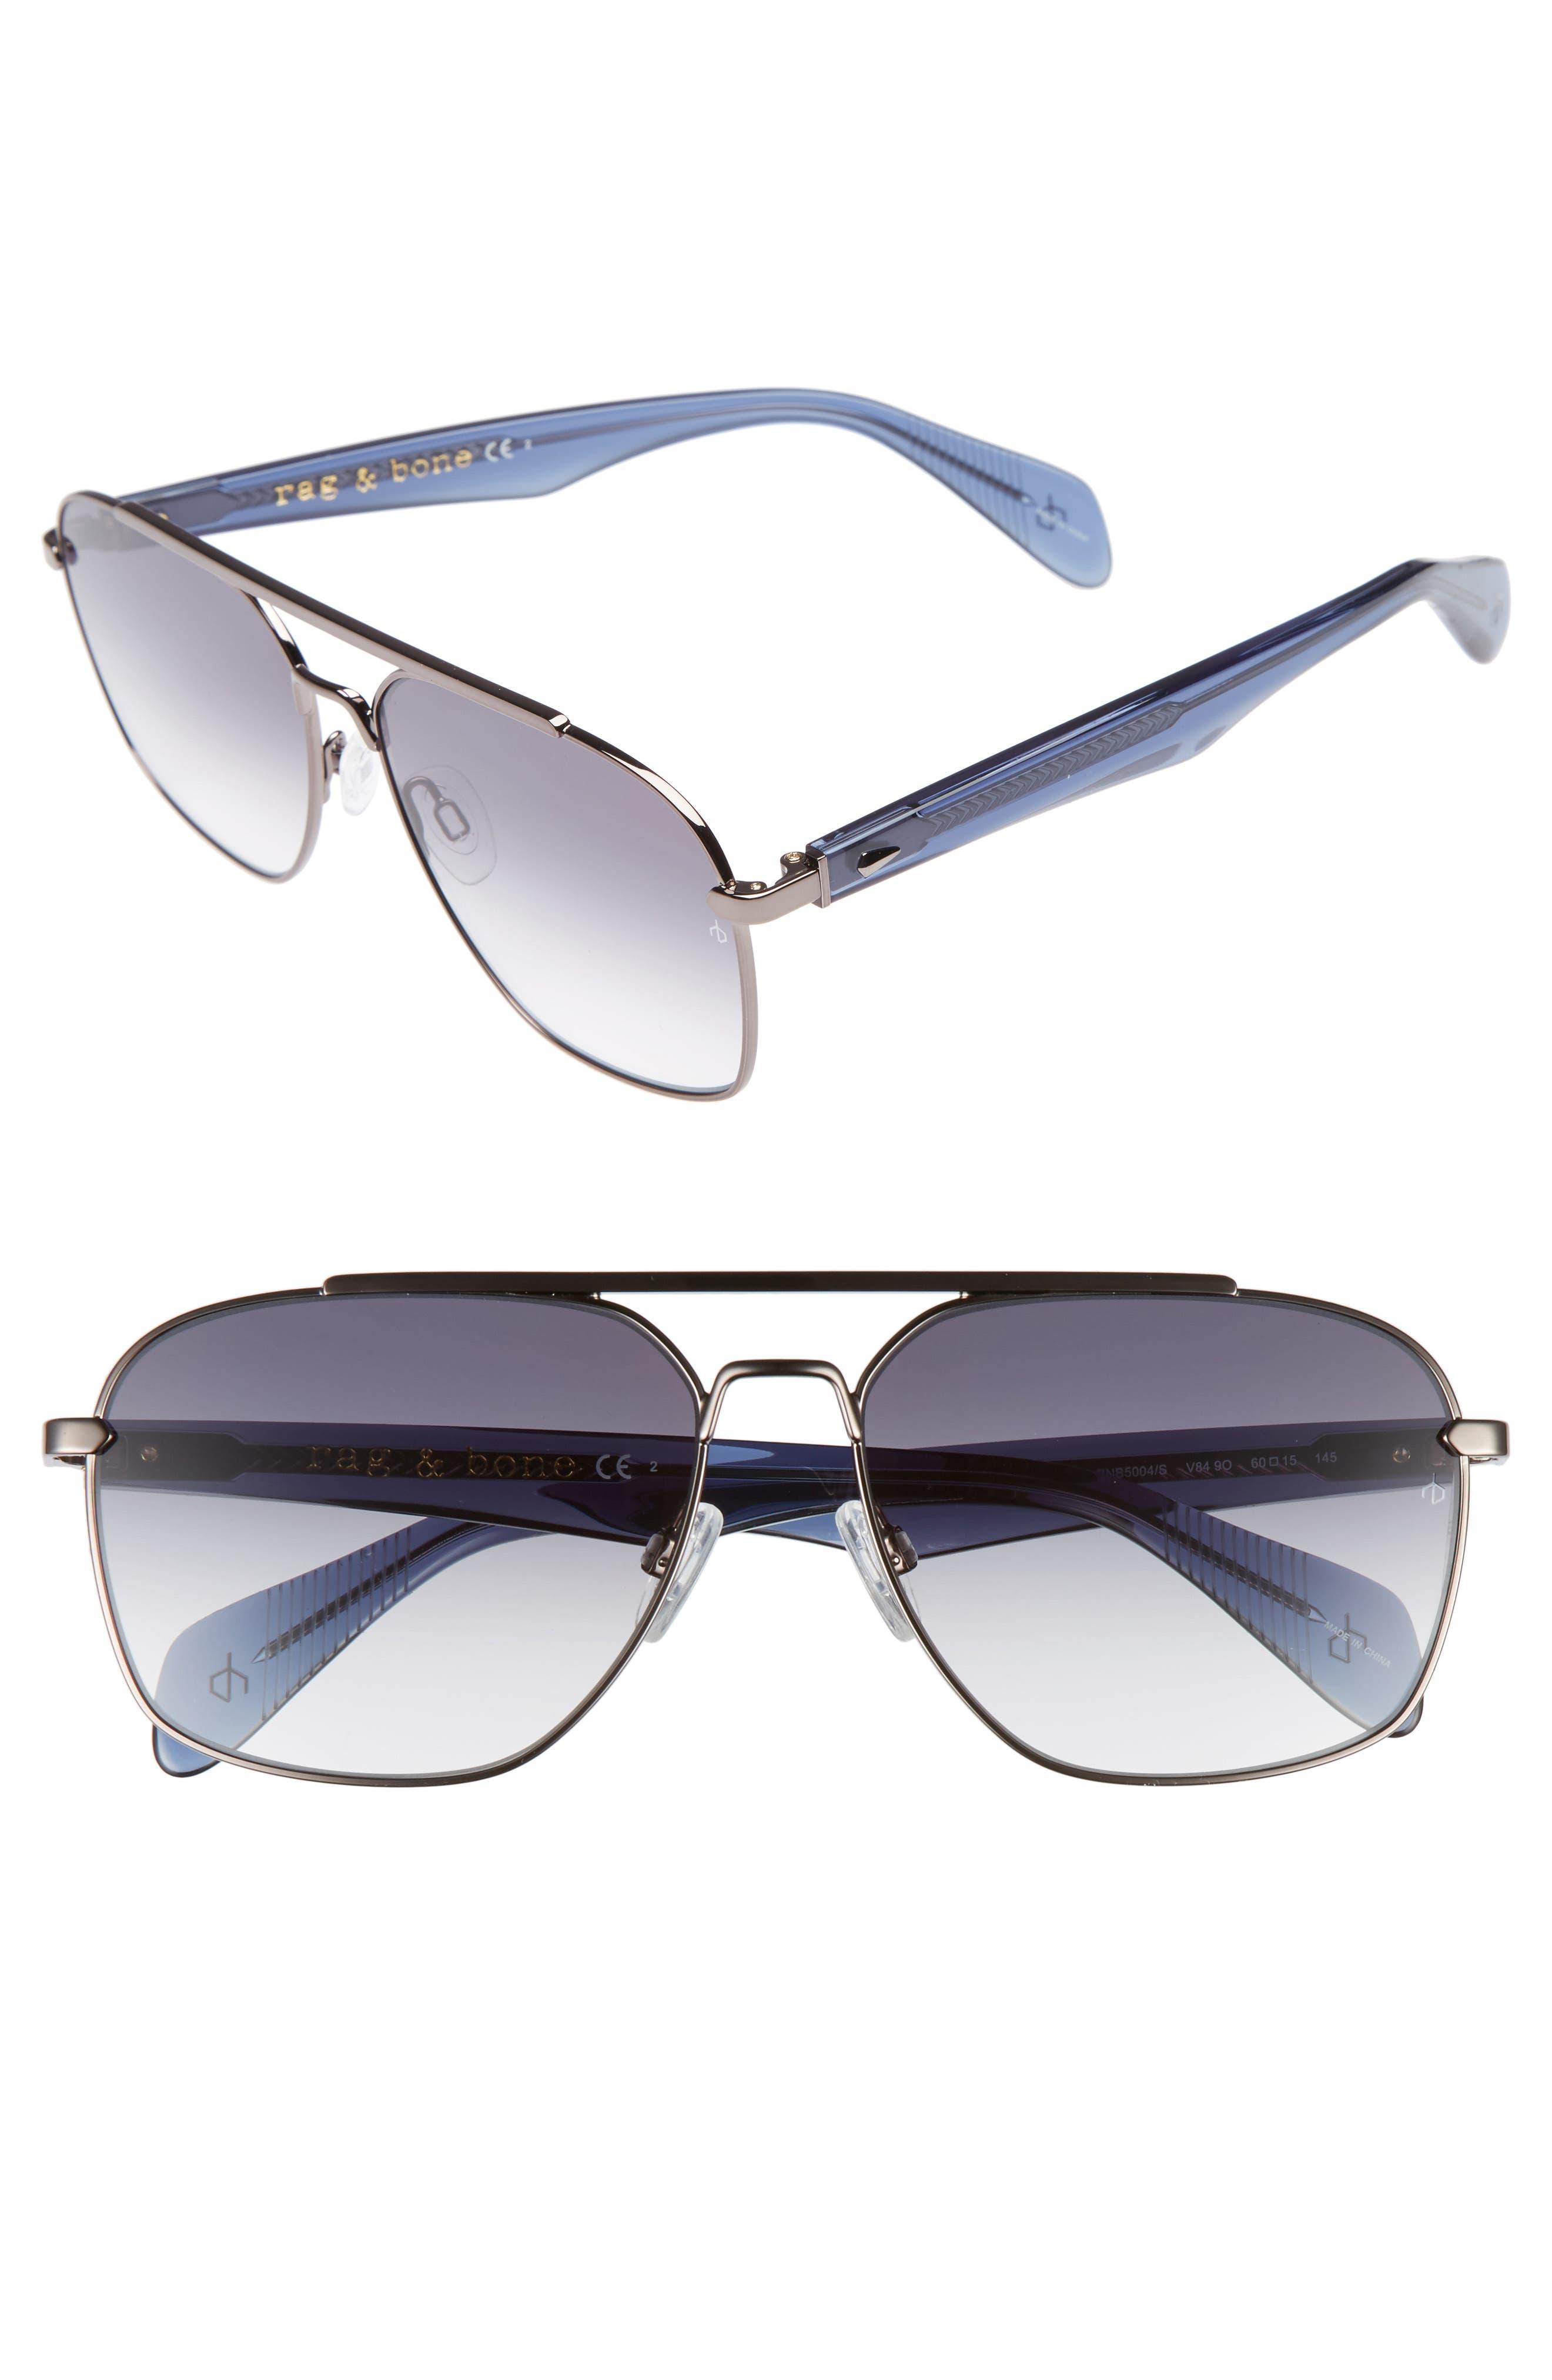 60mm Gradient Navigator Sunglasses,                             Main thumbnail 1, color,                             Ruthenium Blue/ Grey